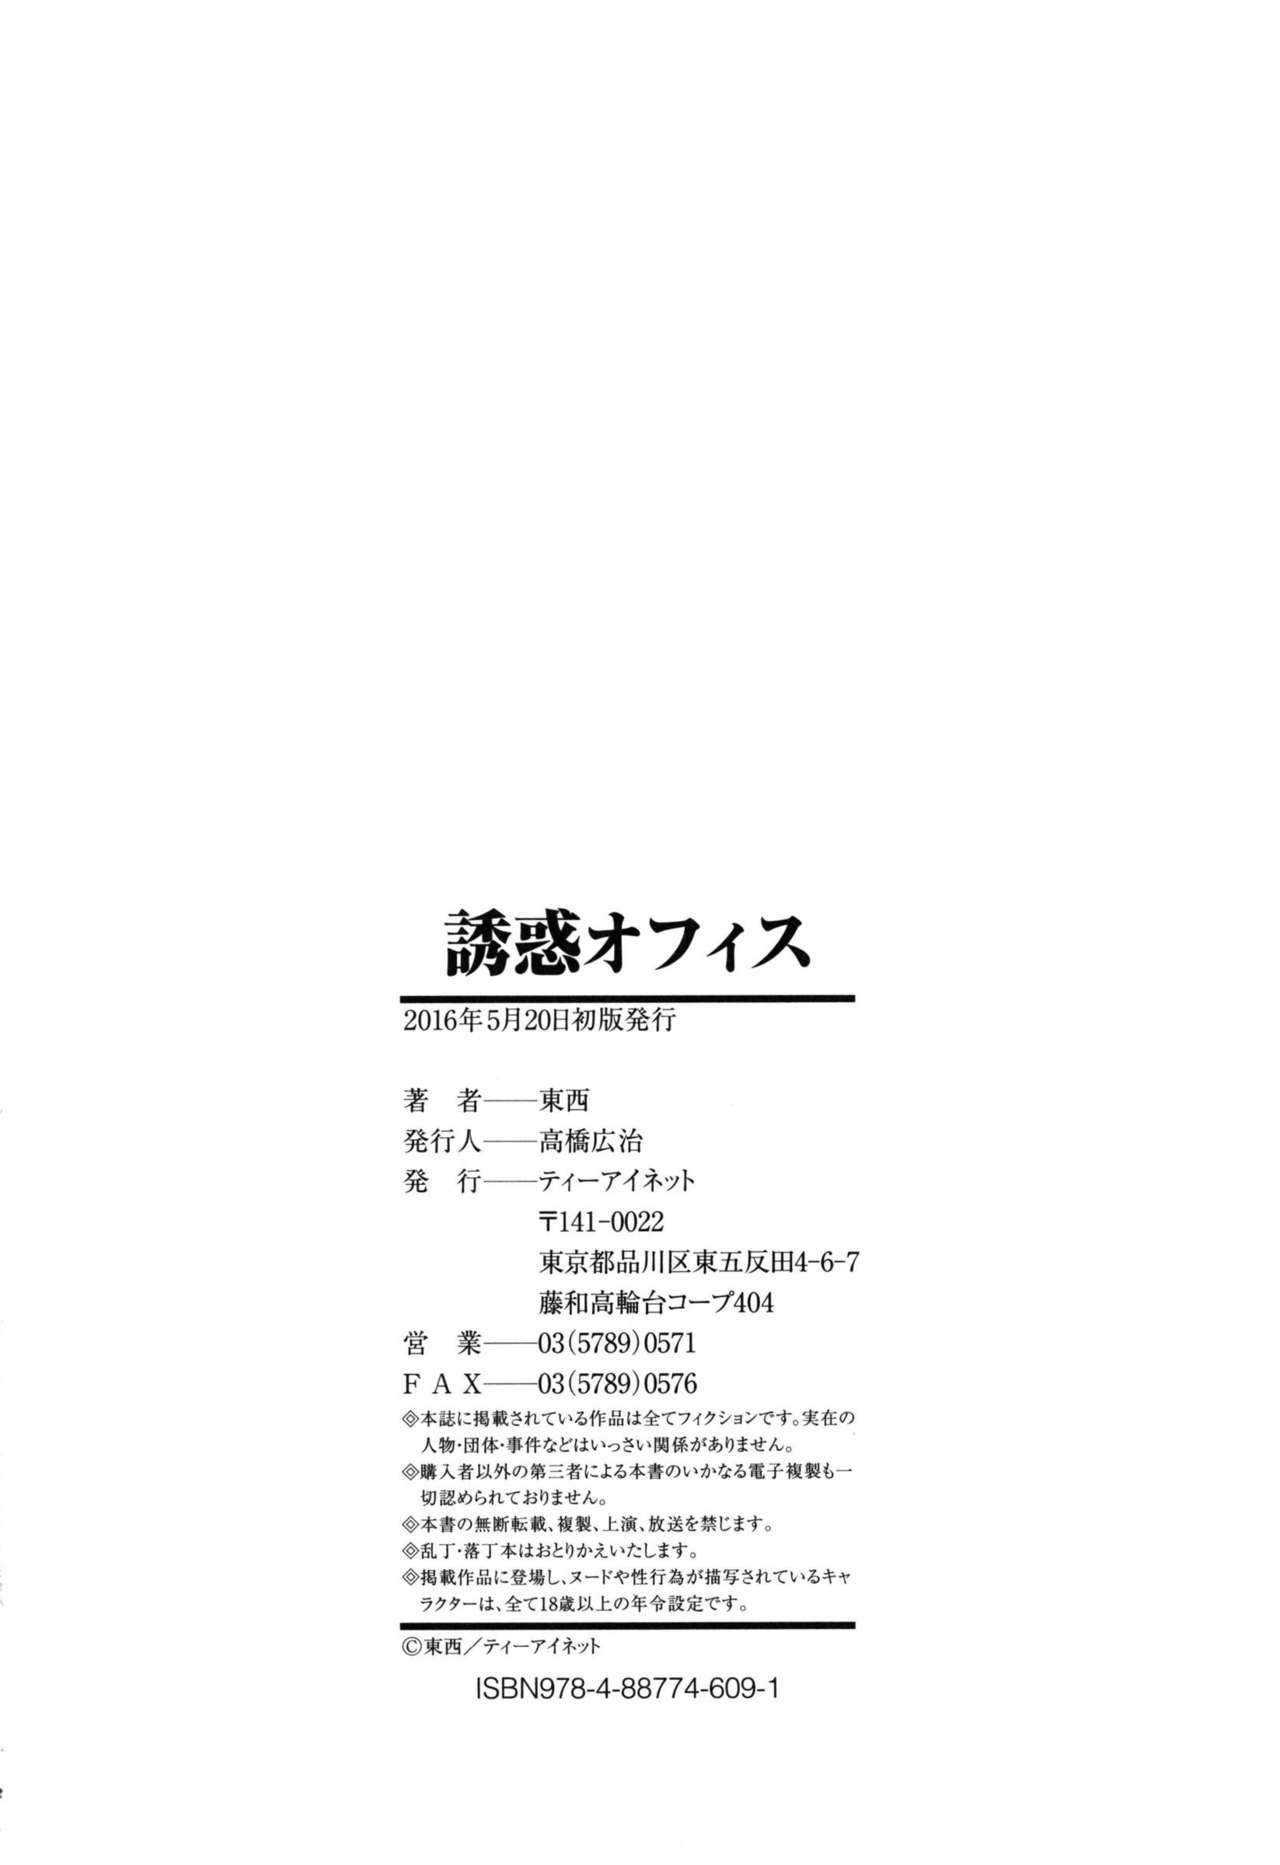 Yuuwaku Office | Office Love Scramble 213